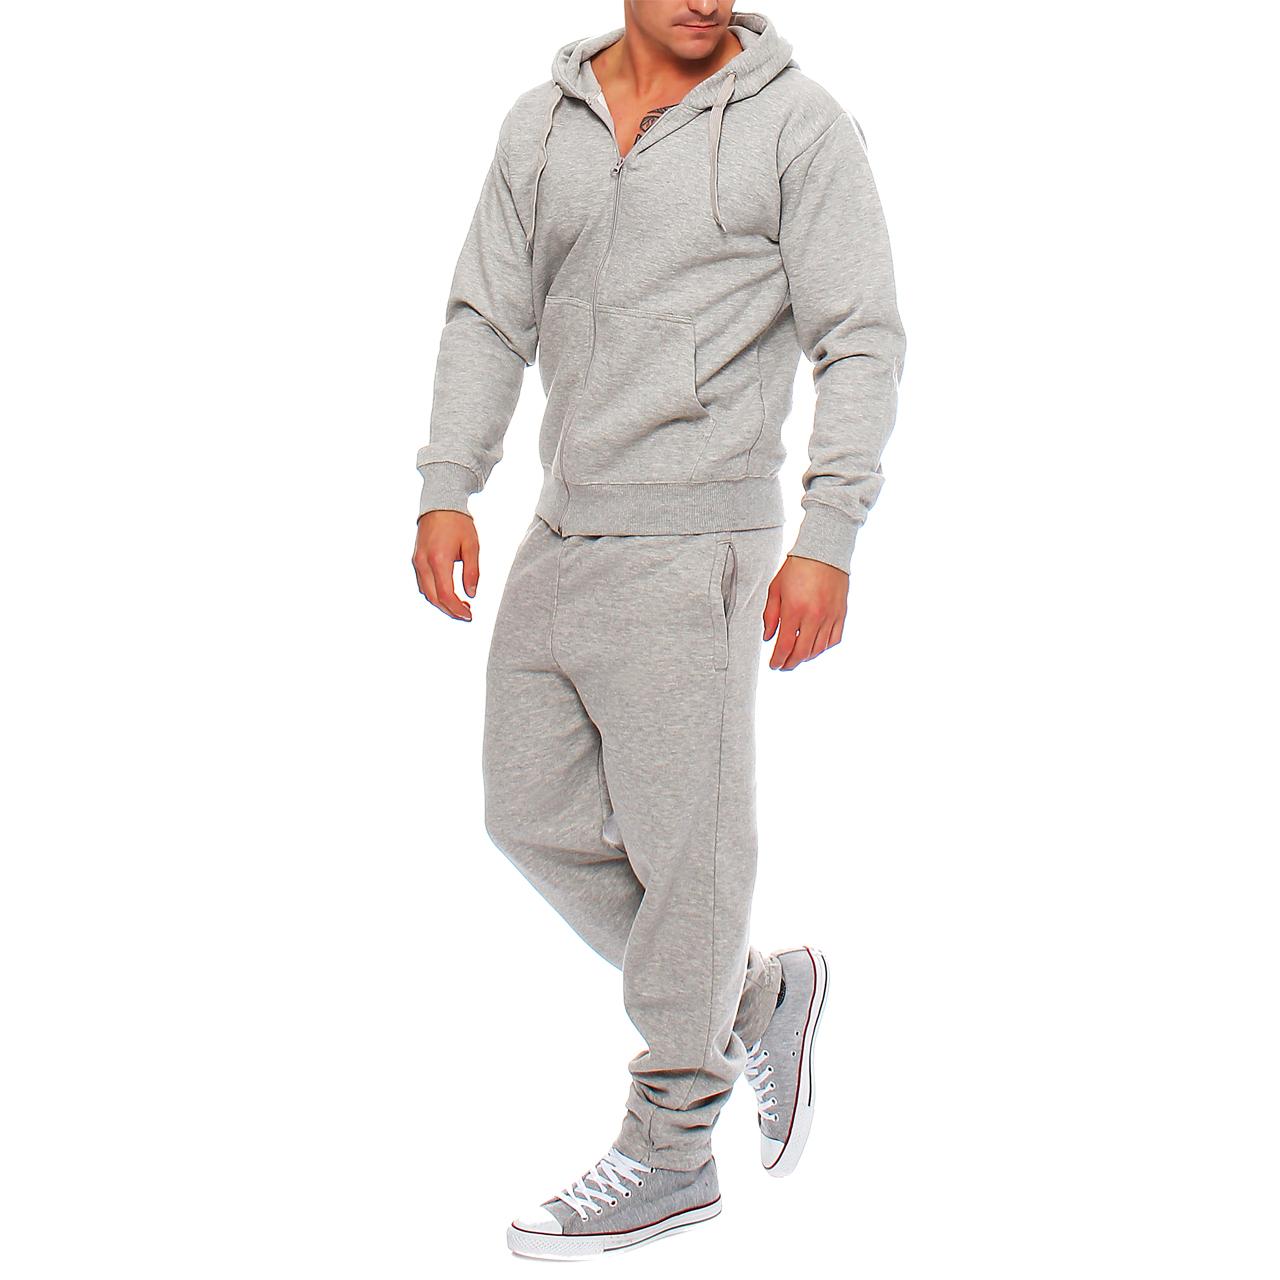 hype inc men 39 s jogging suit tracksuit sweatshirt trousers trackies ebay. Black Bedroom Furniture Sets. Home Design Ideas